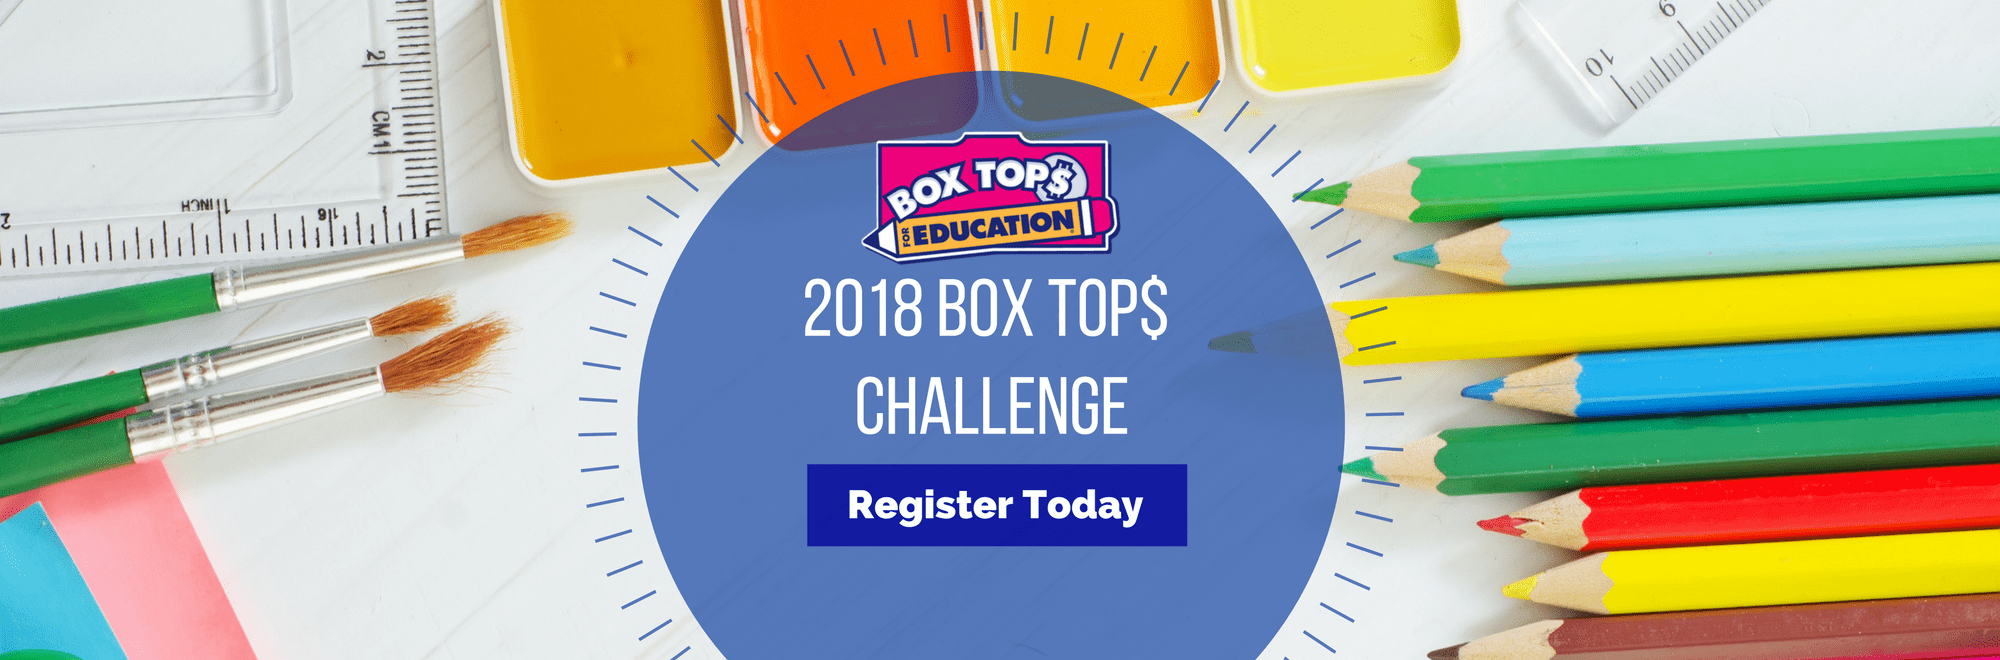 2018 Box Tops Challenge